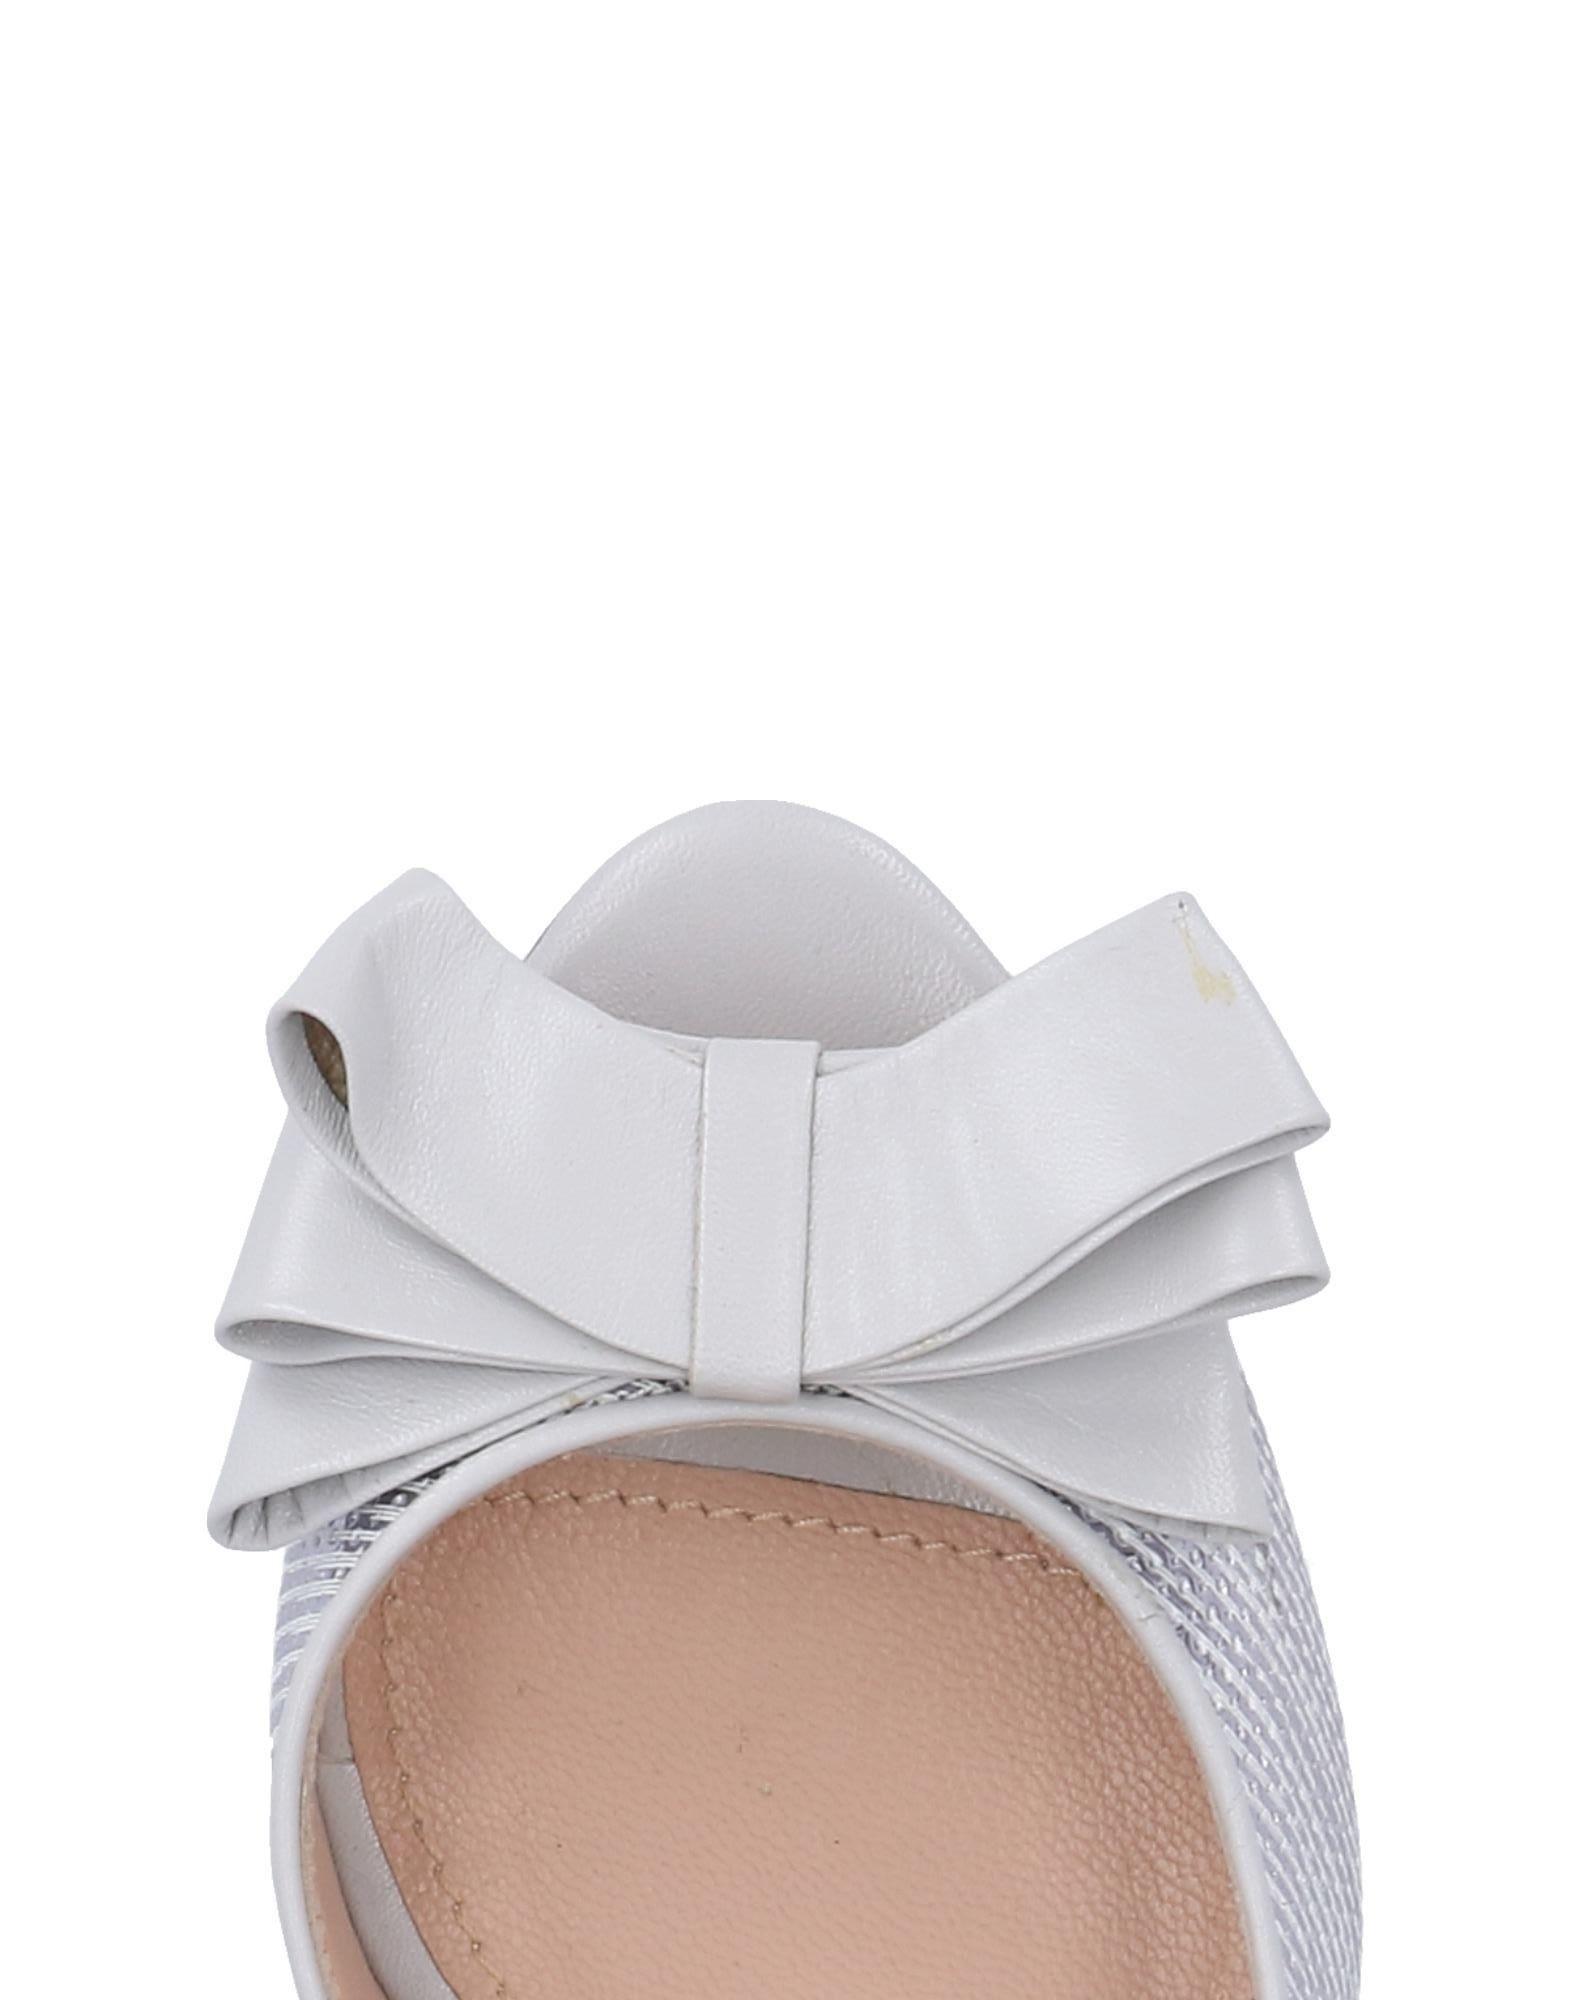 Stilvolle Martino billige Schuhe Enzo Di Martino Stilvolle Pumps Damen  11496732SF 5ac19d